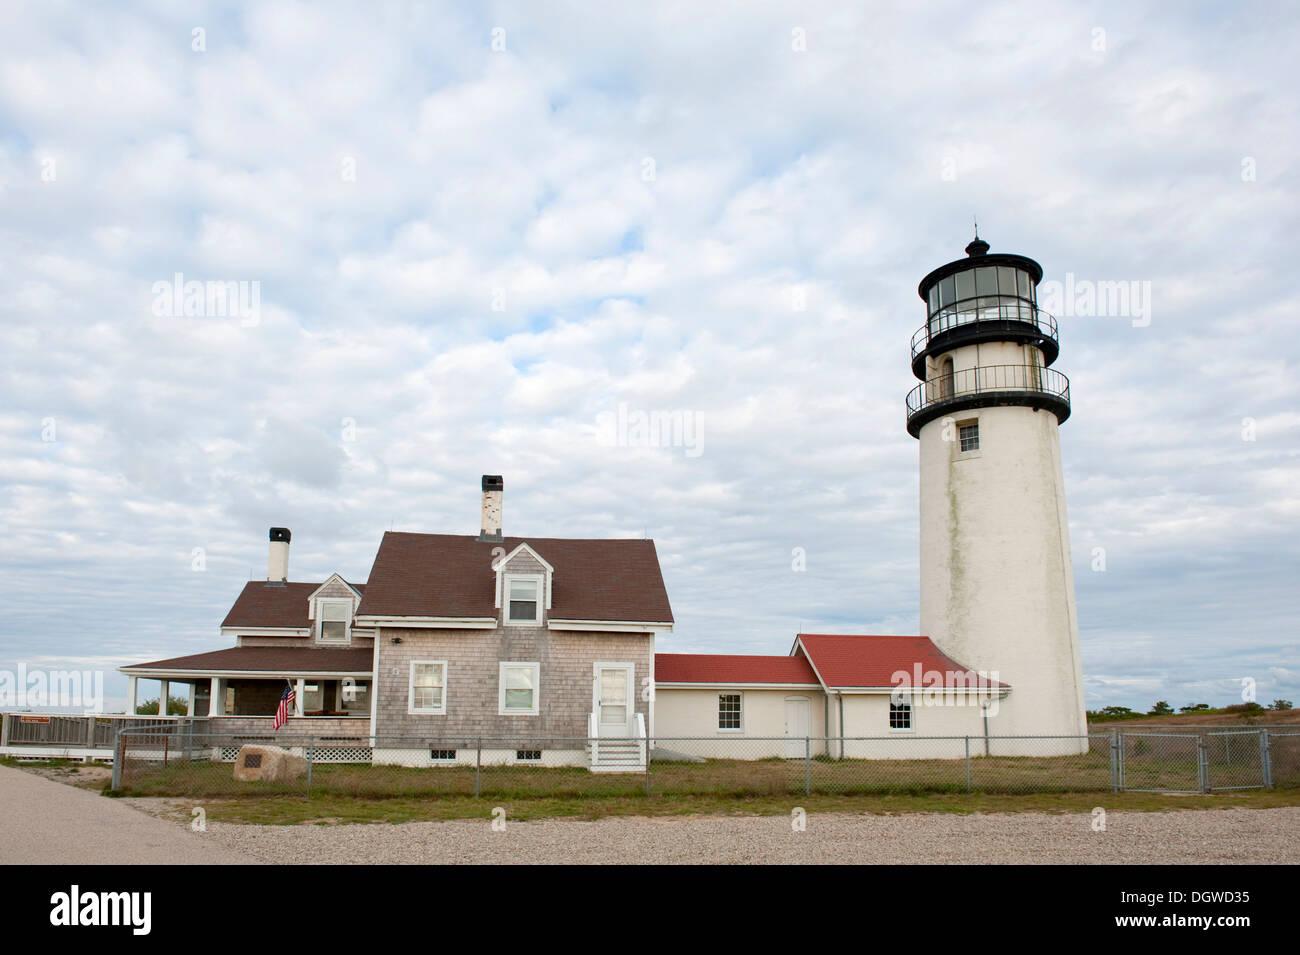 Lighthouse, Highland Light, North Truro, Cape Cod National Seashore, Massachusetts, New England, USA, North America - Stock Image